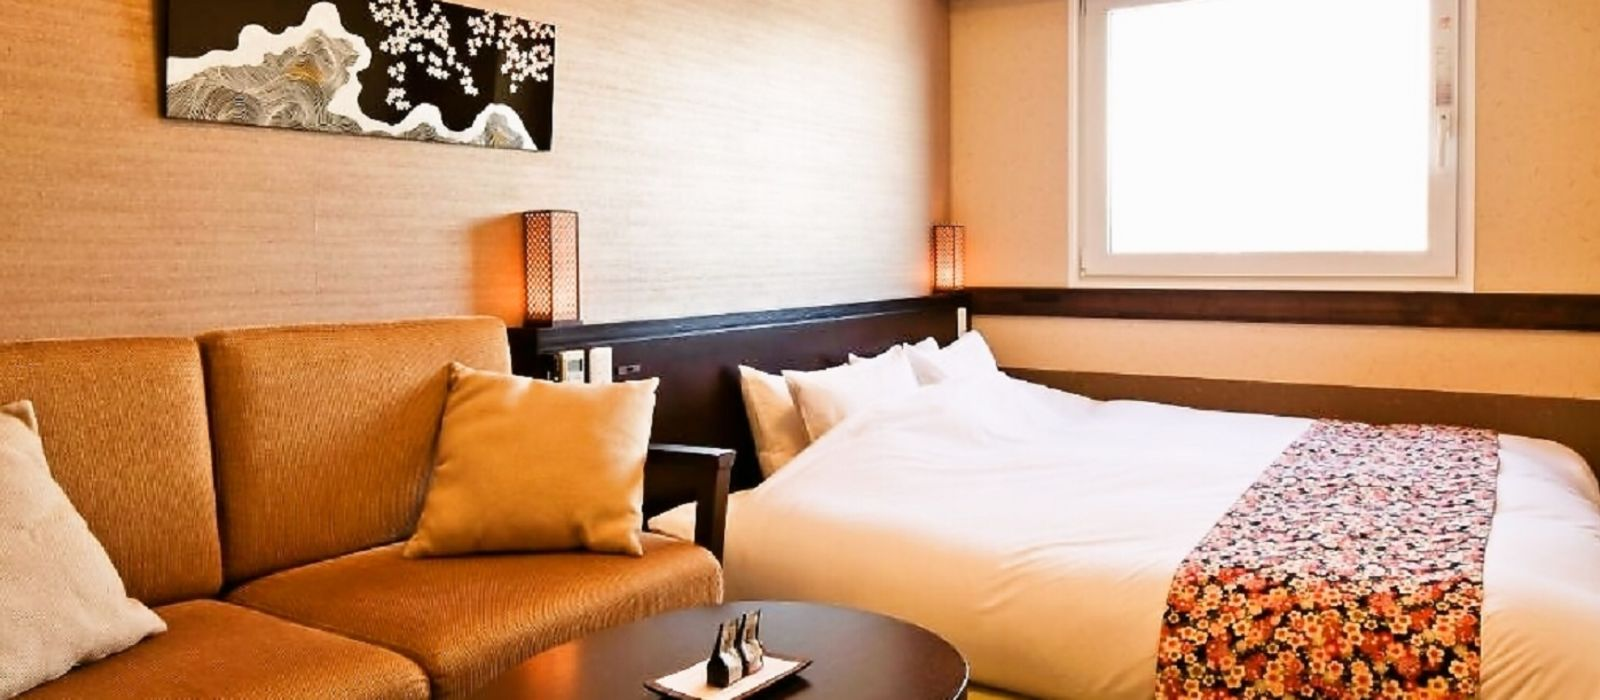 Hotel Takayama Ouan Japan